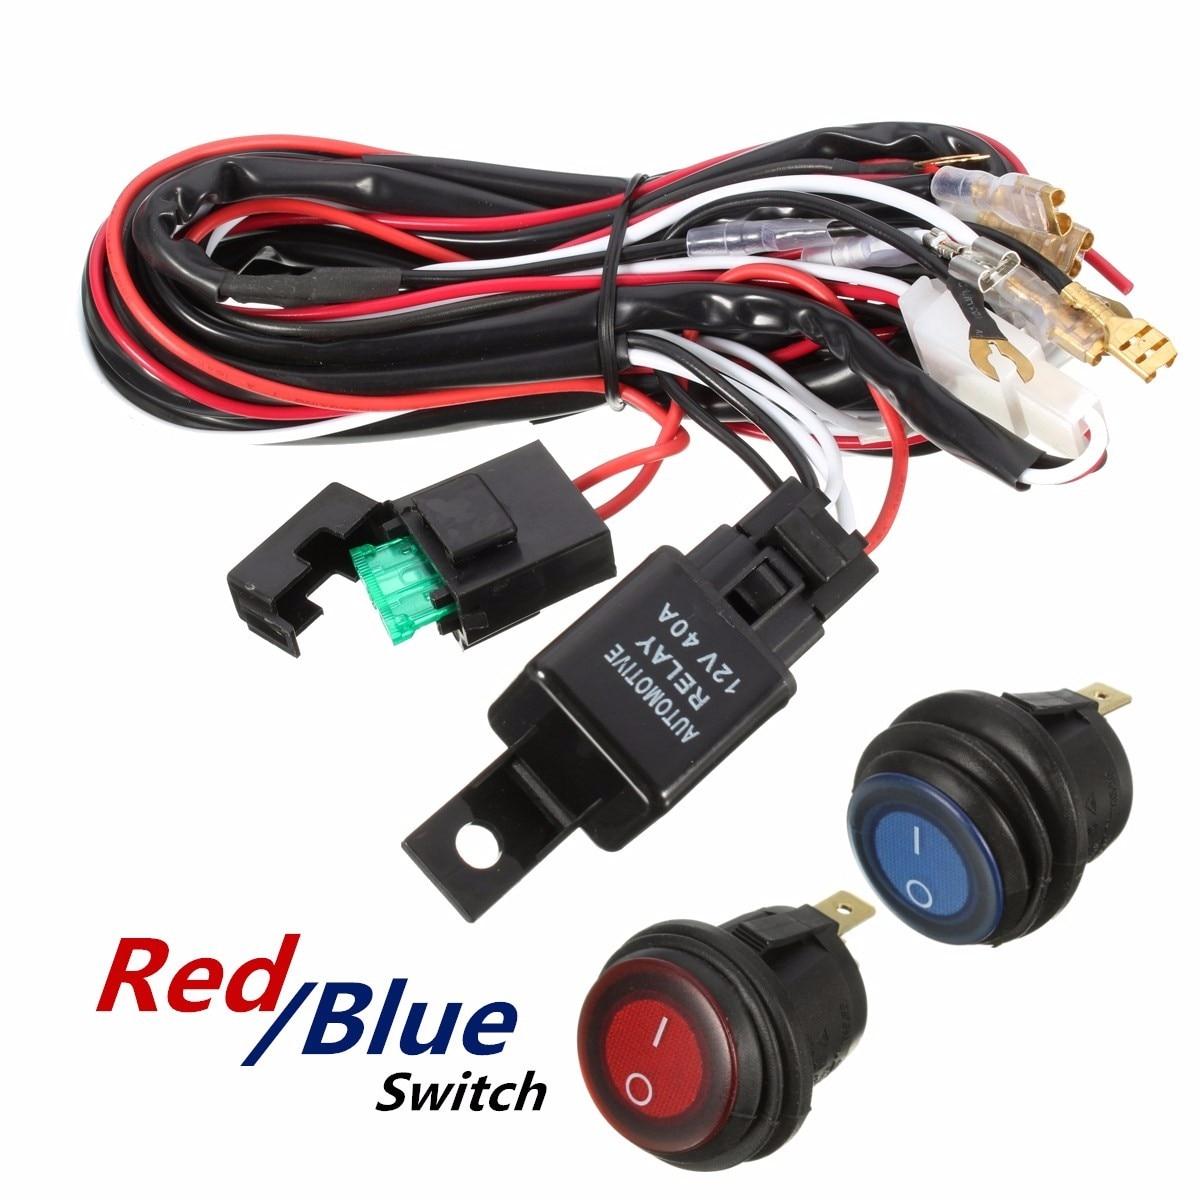 Oem Odm Auto Window Control Wiring Harnesses Black White Red Waterproof Custom Harness